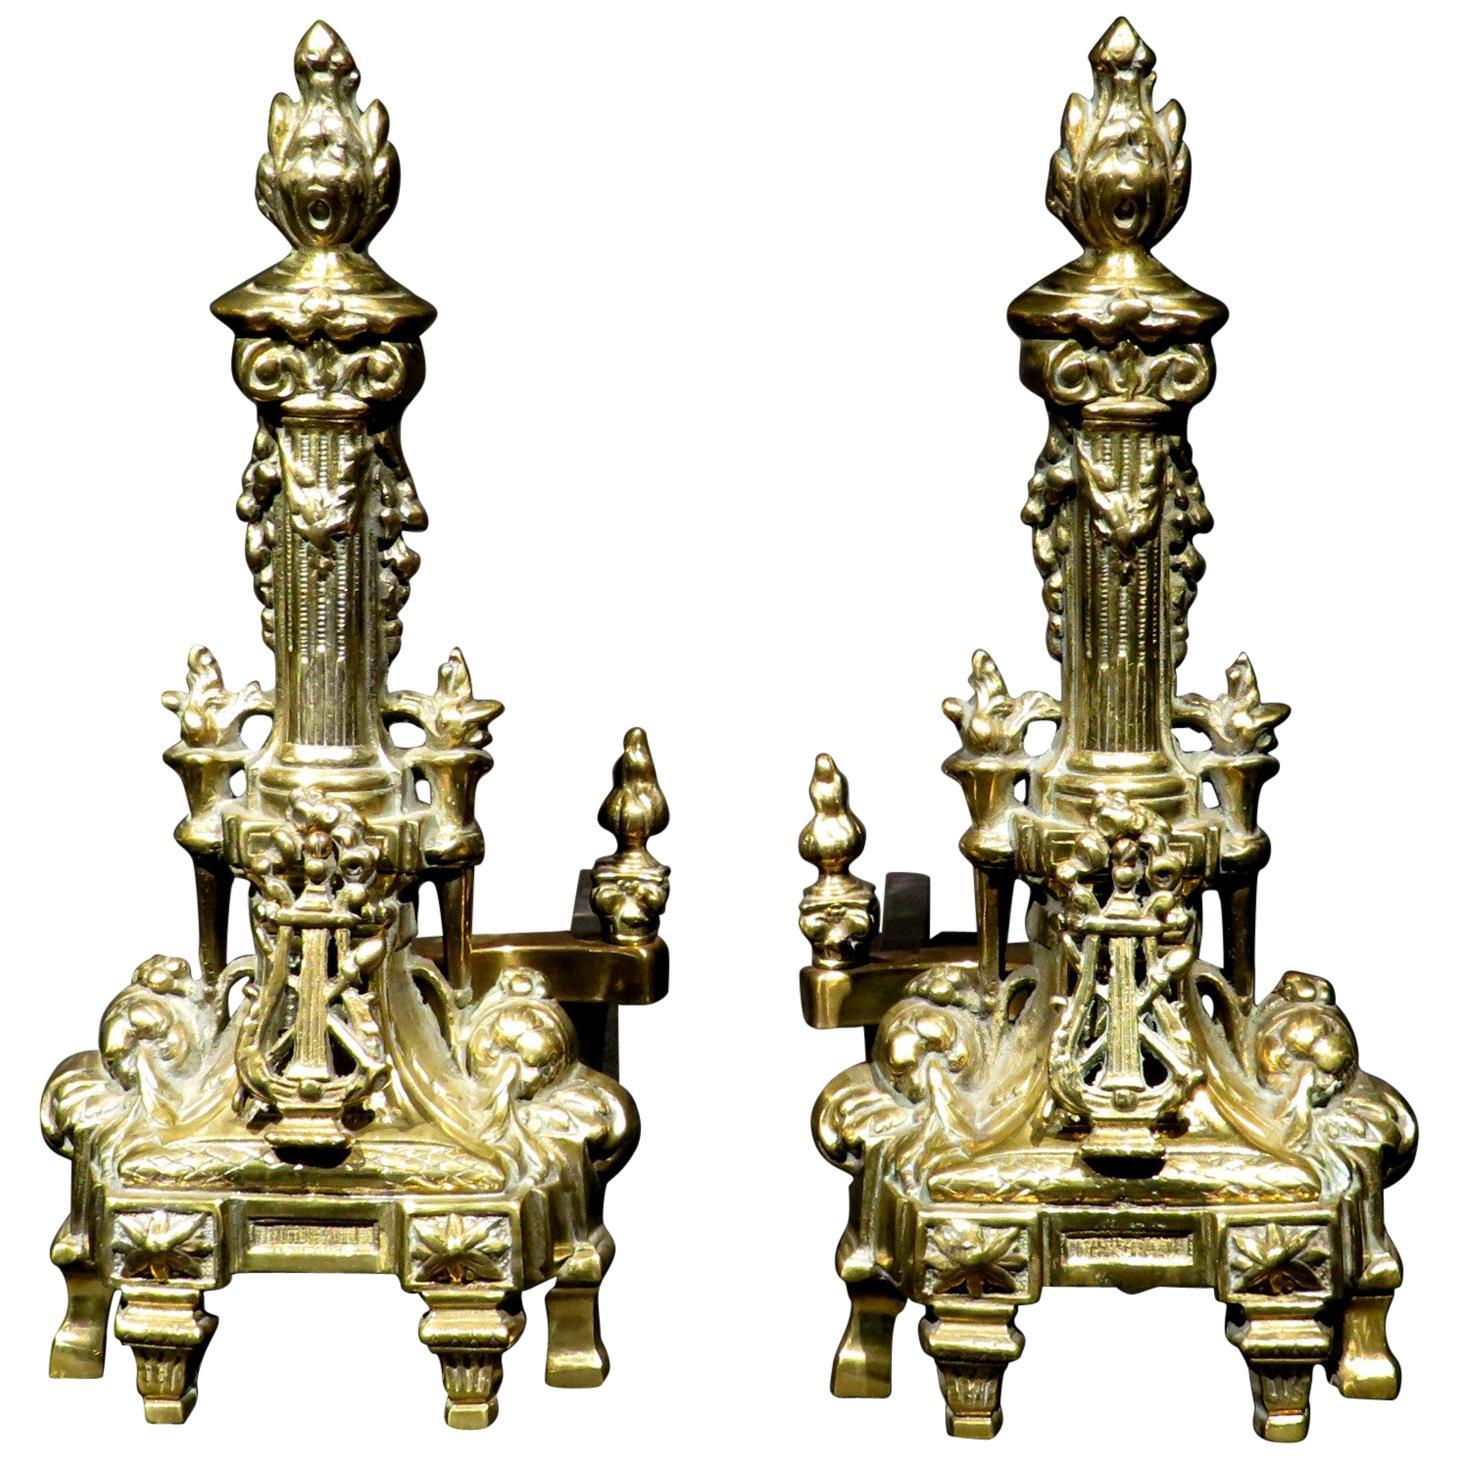 Impressive Pair of Louis XVI Style Gilt Bronze Chenets, France Circa 1900